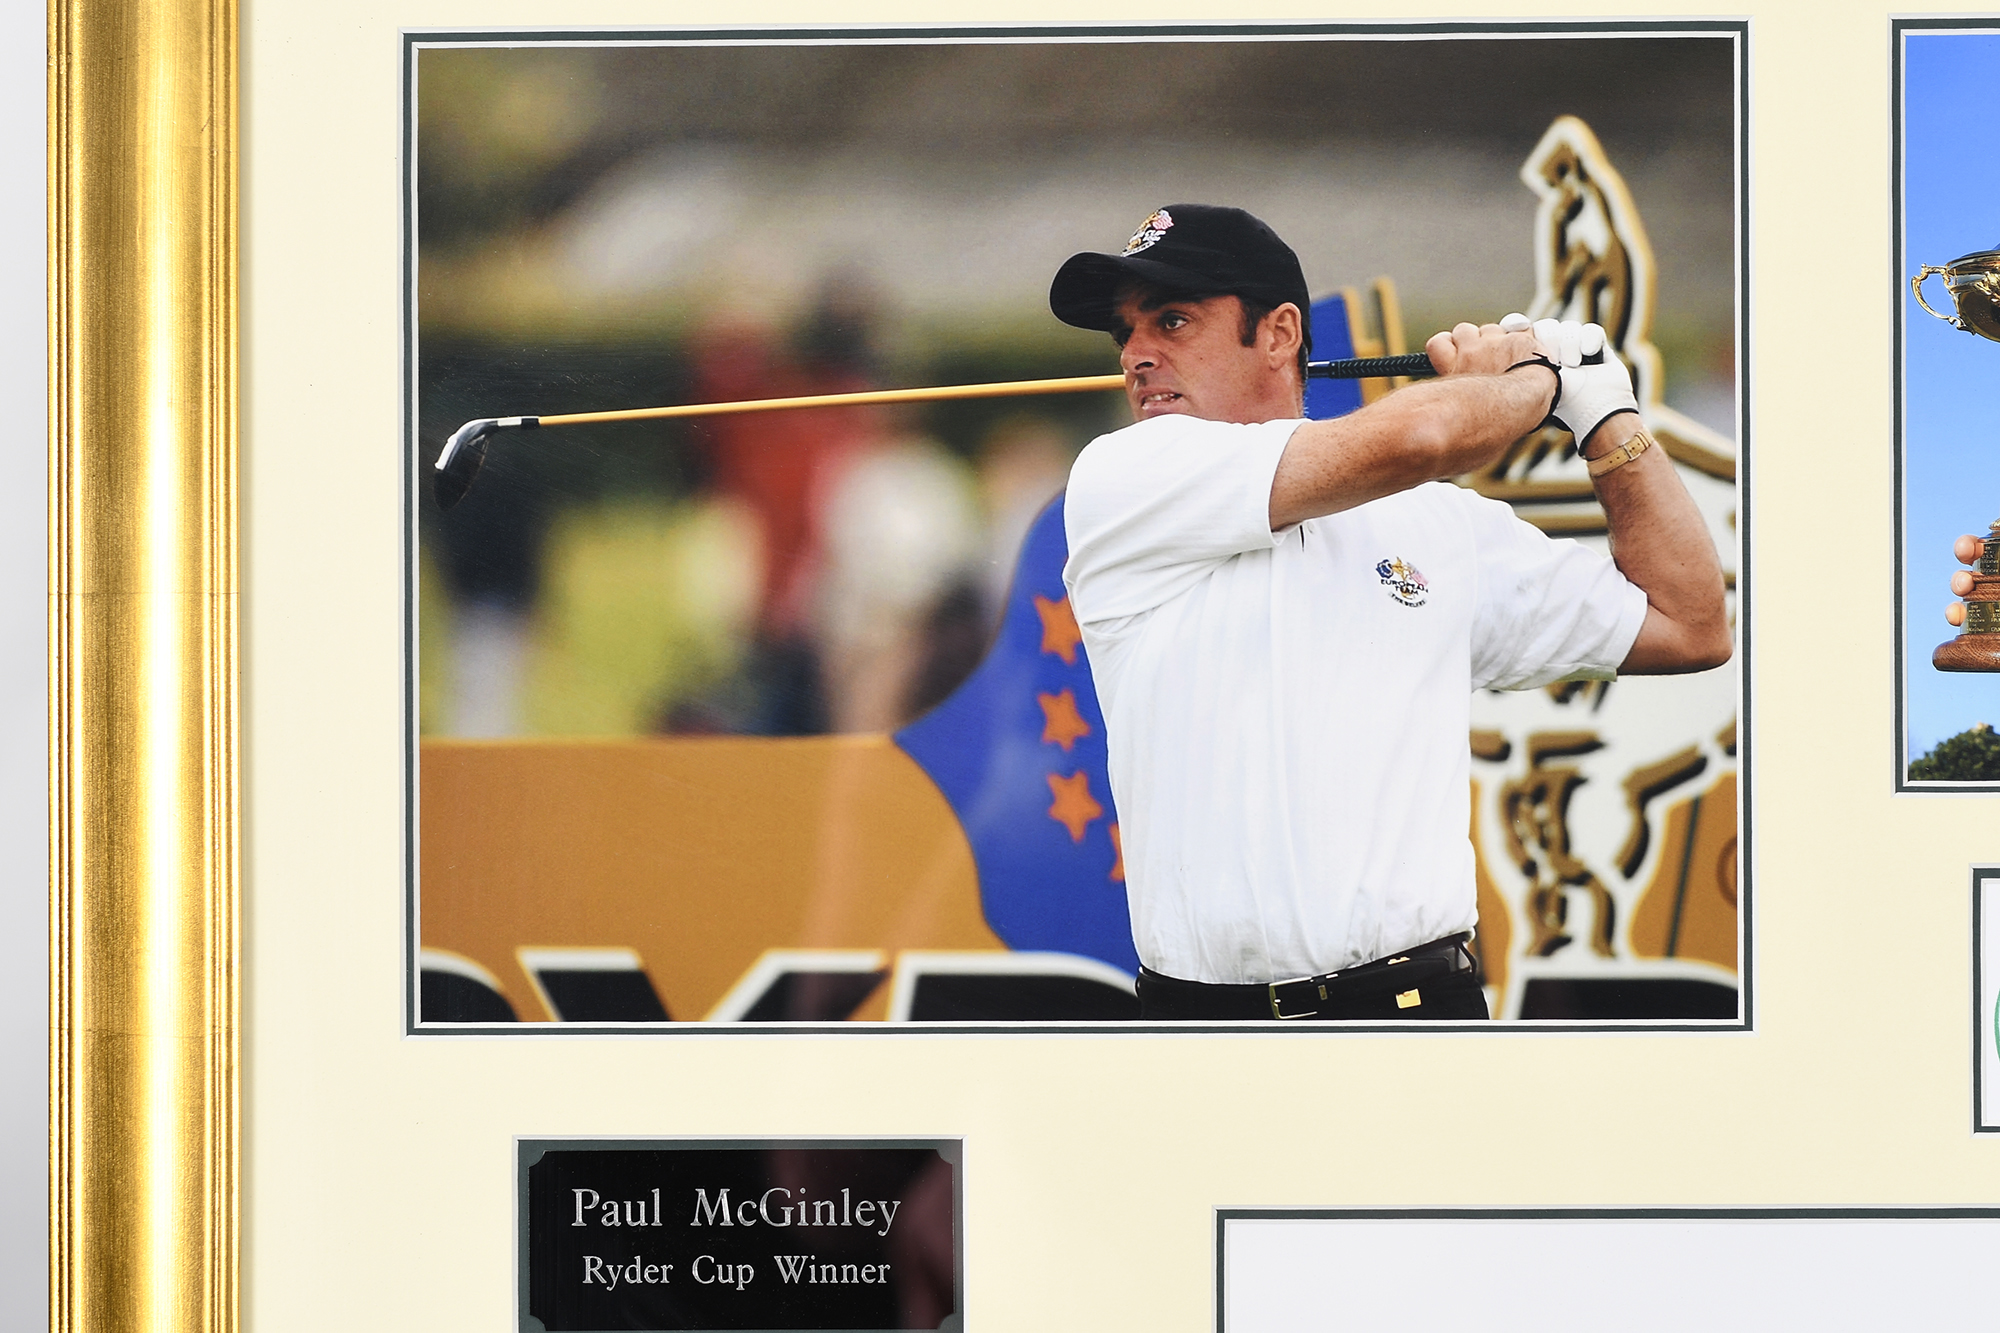 Paul Mcginley Framed Signature Presentation - Image 3 of 6